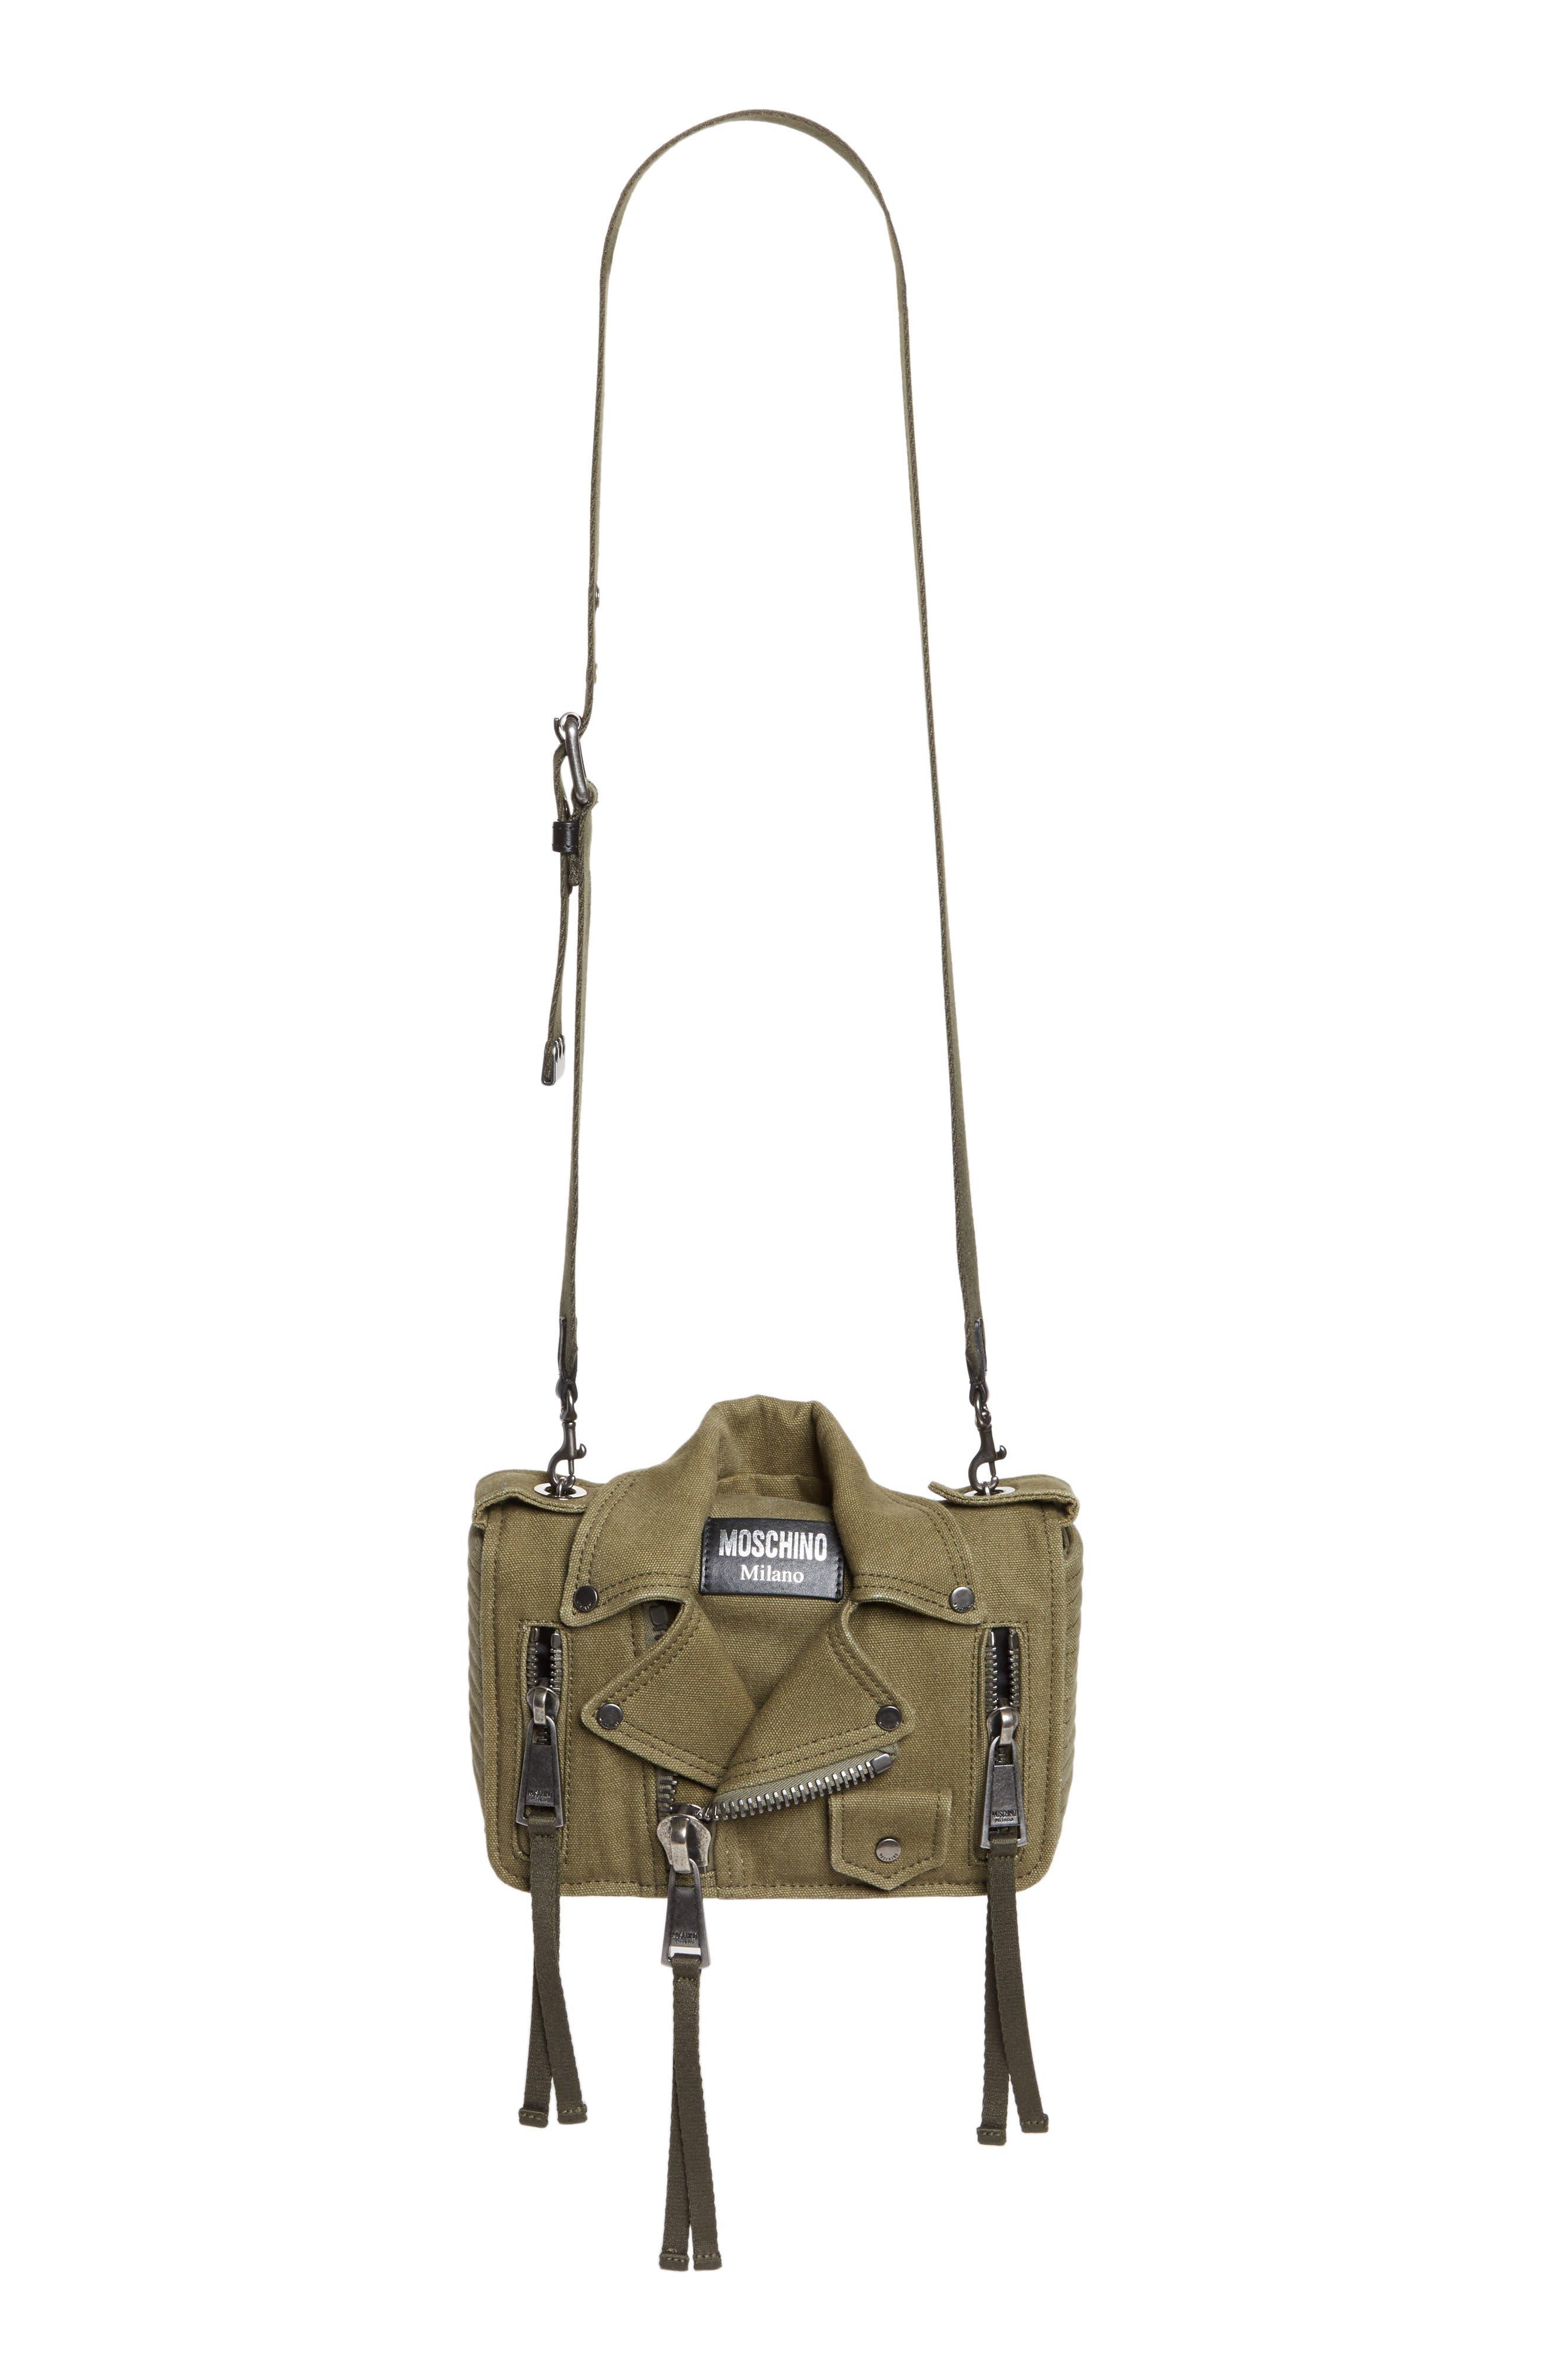 Moschino Small Biker Jacket Shoulder Bag